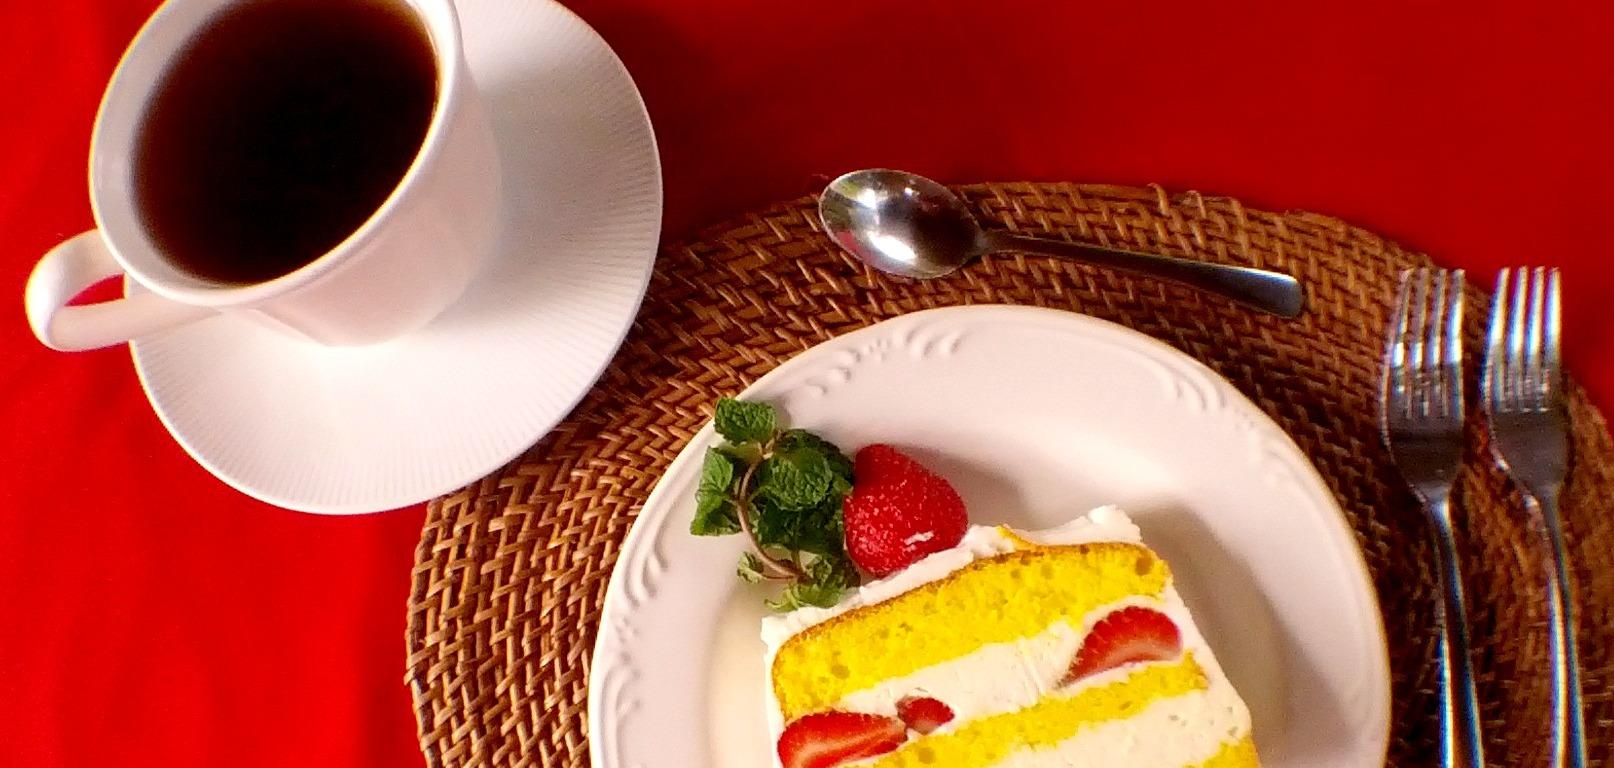 Wayan Cafe & Bakery ' s Strawberry Cheese Cake